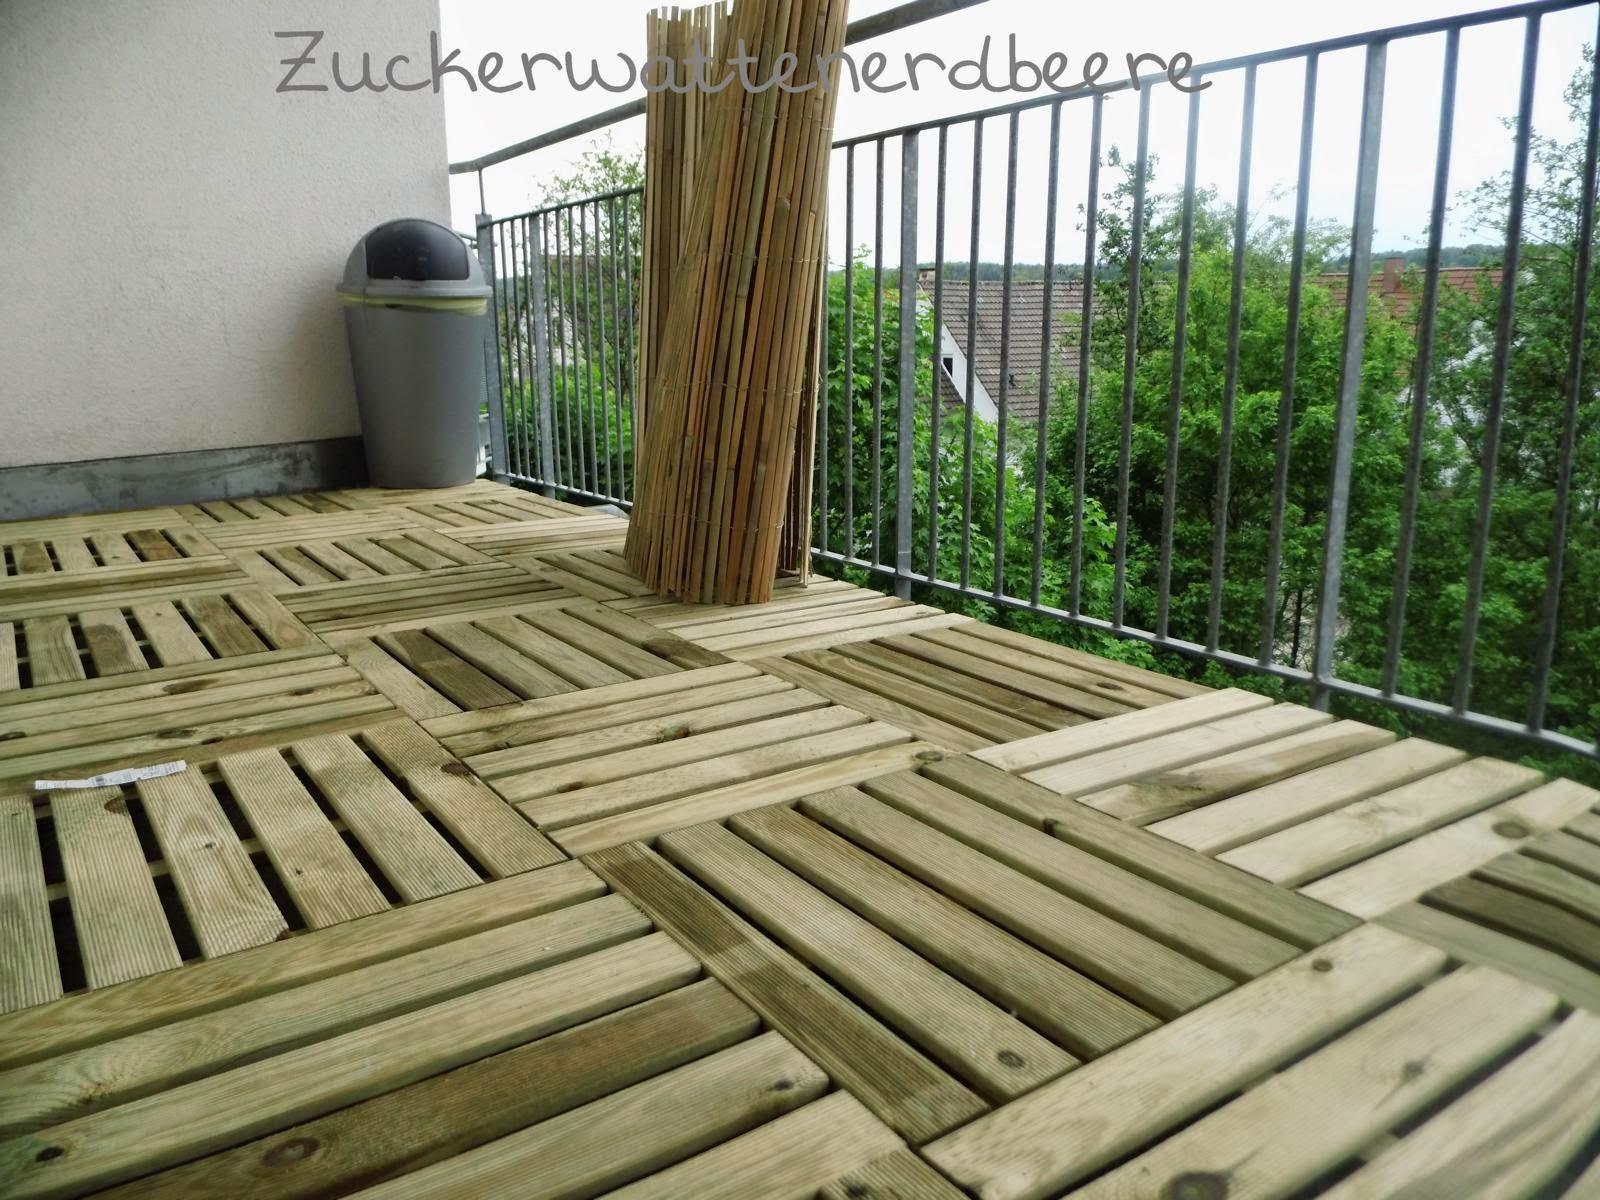 Balkon Sichtschutz Aus Holz Fabulous Balkon Sichtschutz Aus Holz